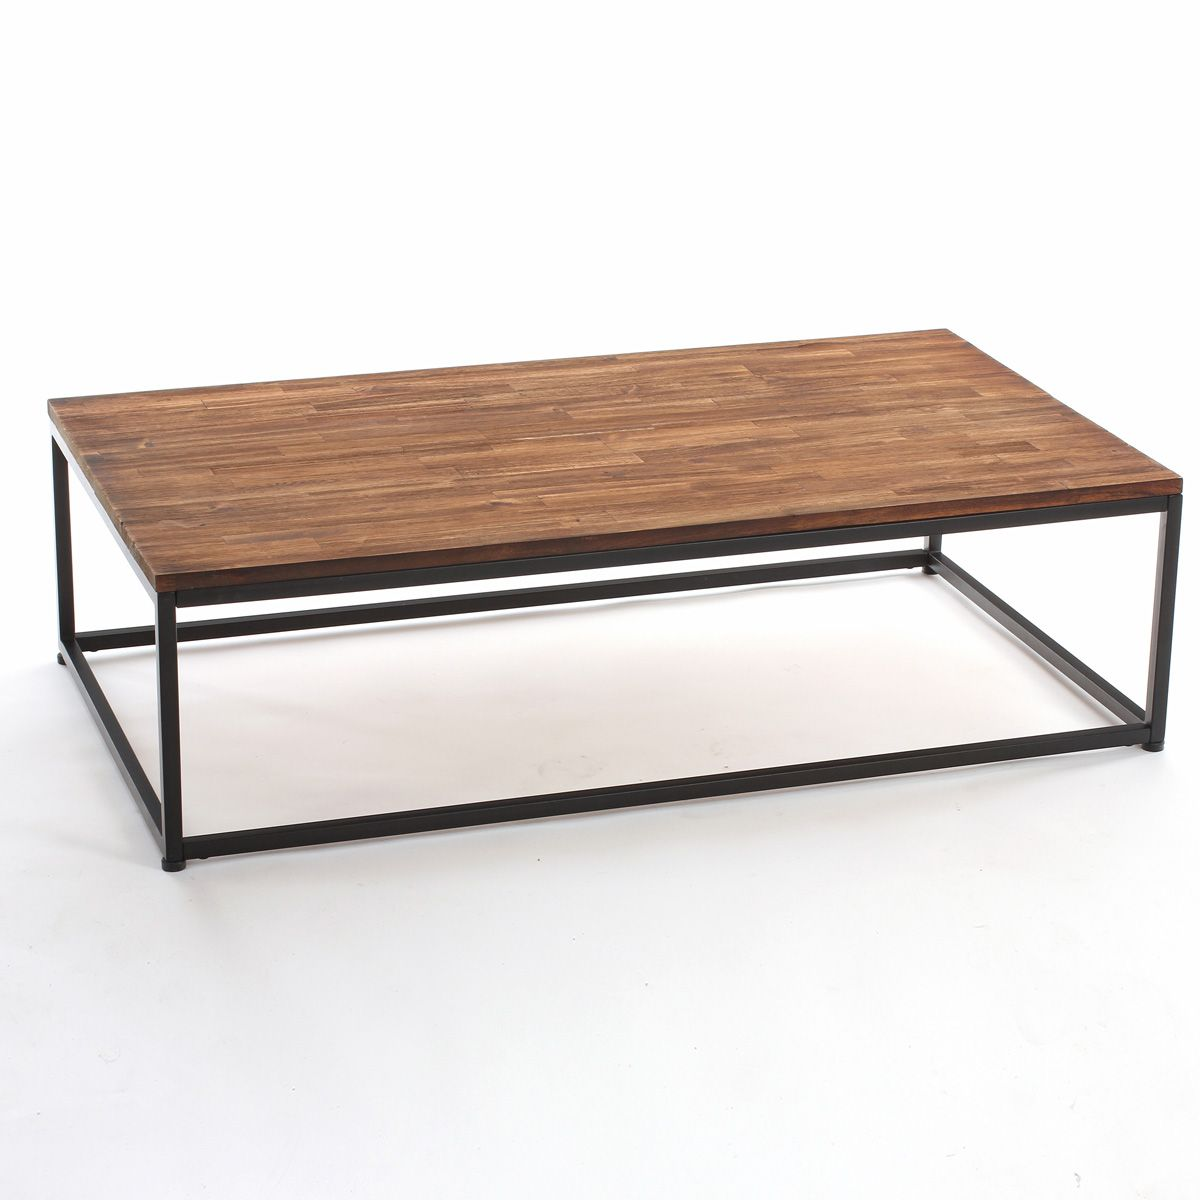 Table basse vintage taupe